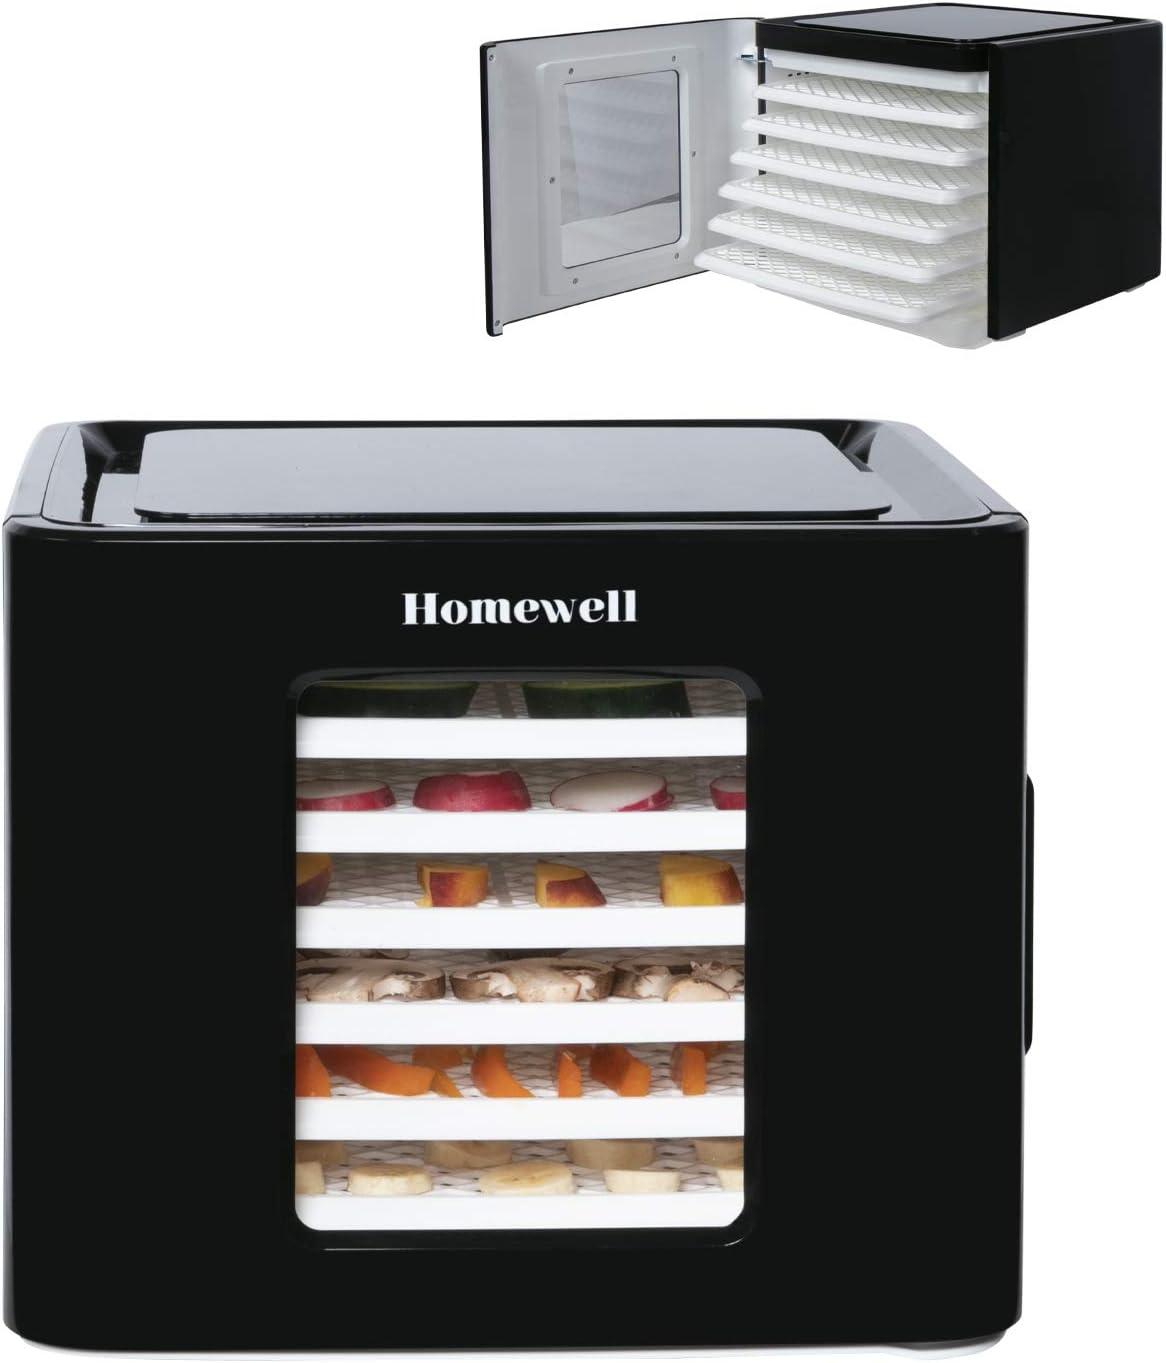 Homewell Food Dehydrator Machine Dryer for Fruits & Vegetables, Adjustable Timer, Digital Temperature Control, 6 Trays Slide-in, 400 Watt